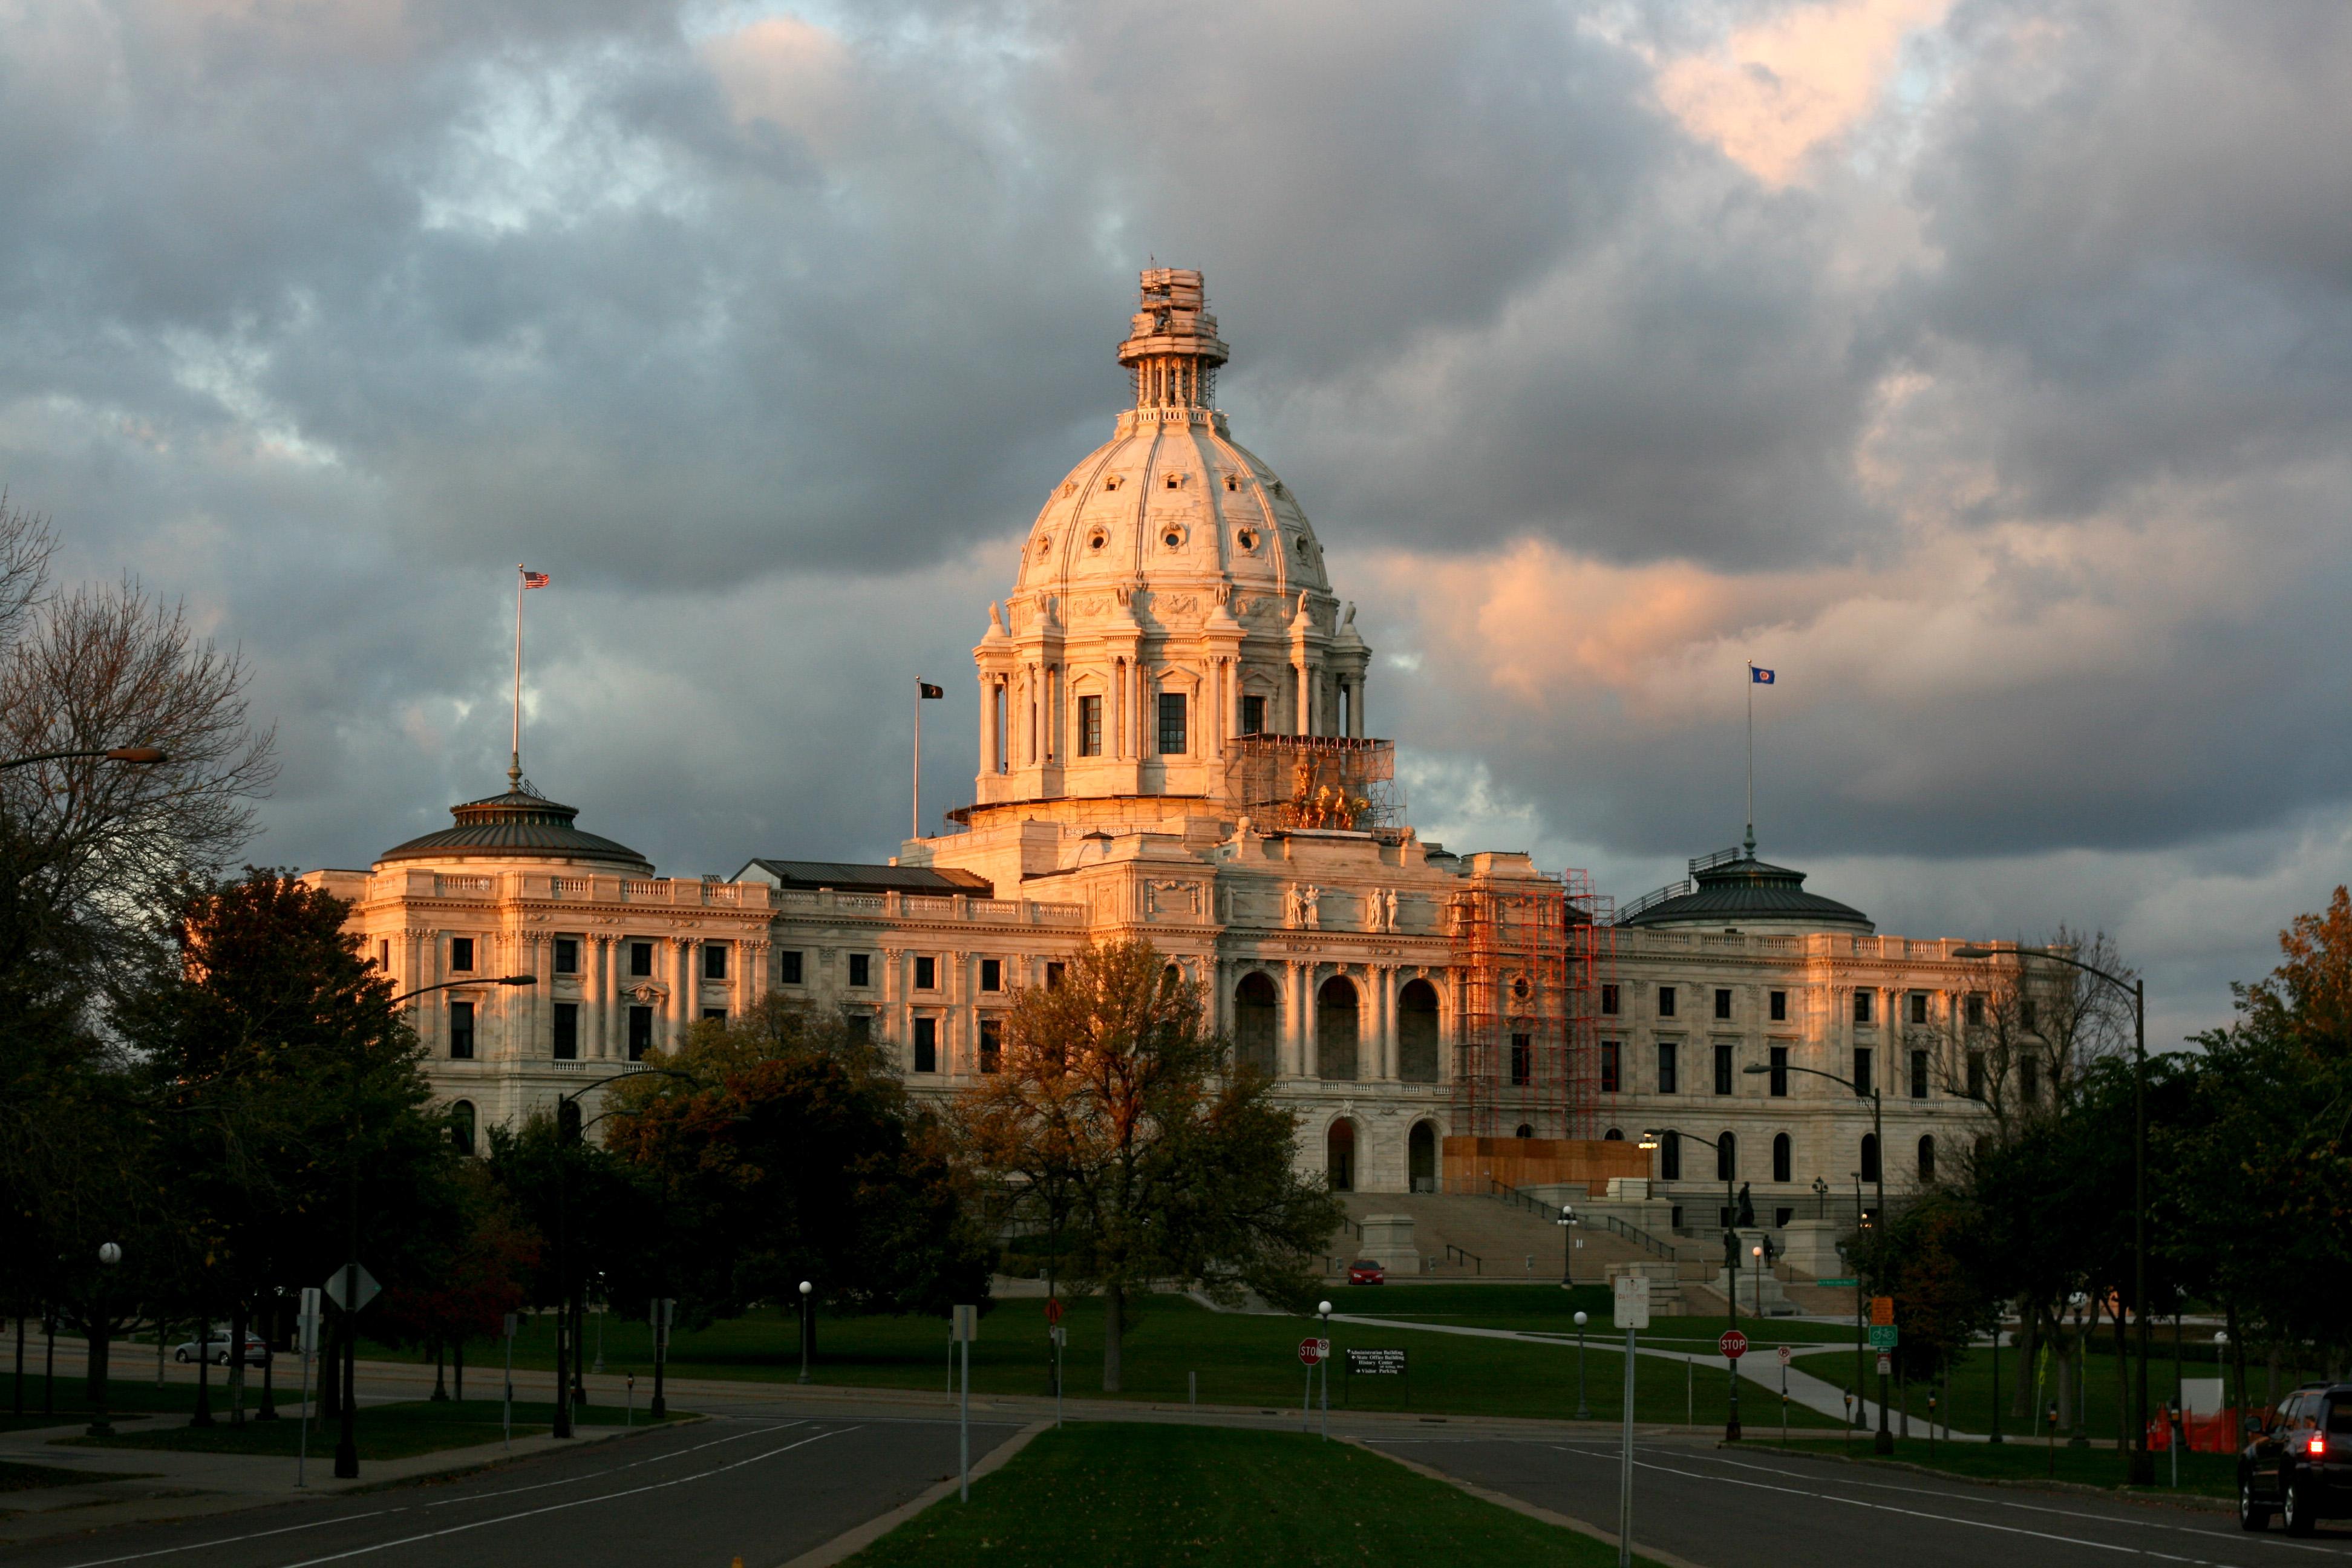 Minnesota State Capitol-Drew Geraets